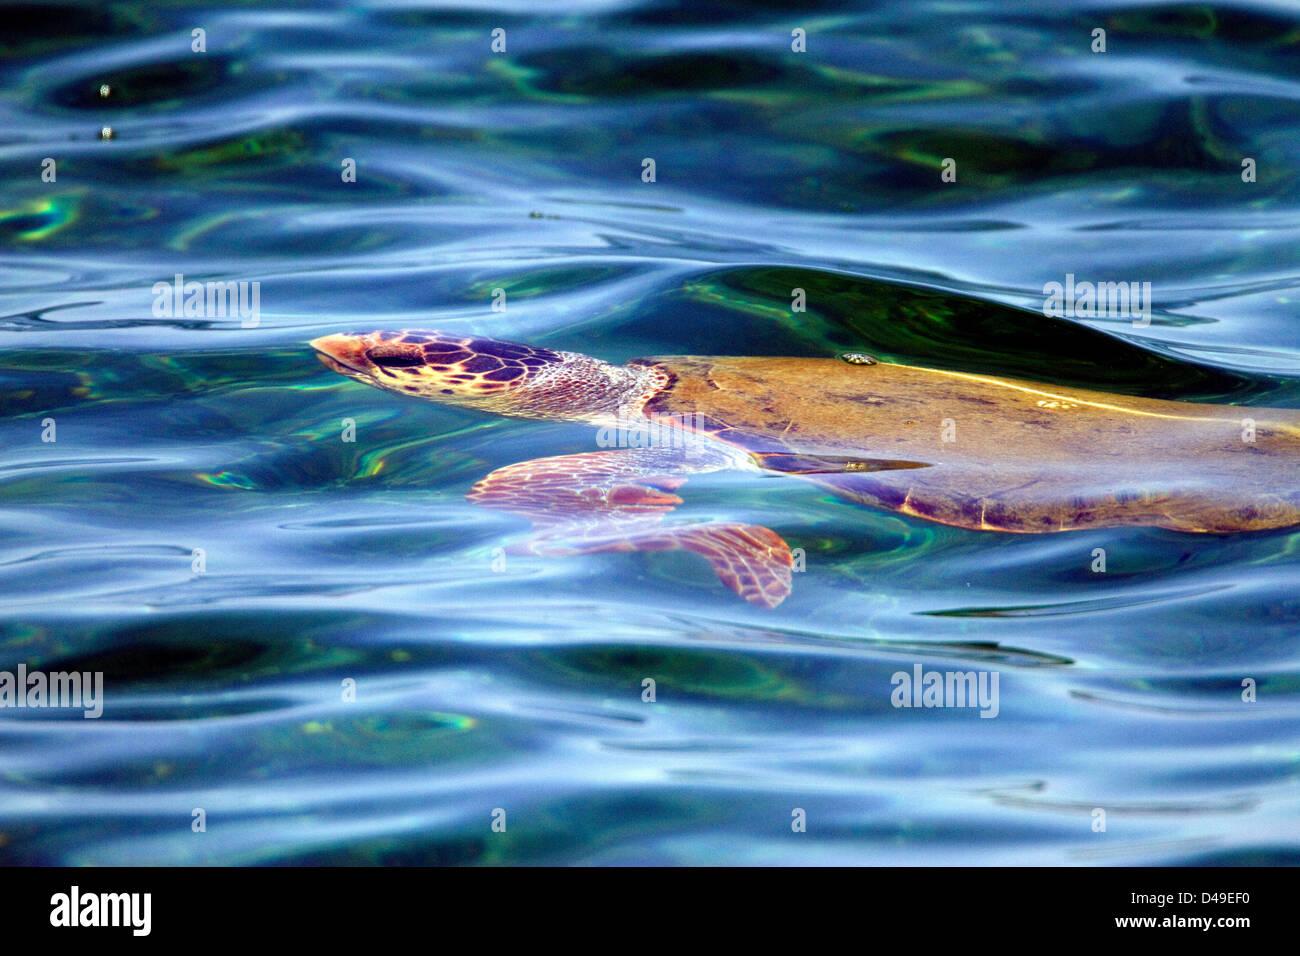 Loggerhead turtle. (Caretta caretta). SWIMMING JUST UNDER THE SURFACE, Crete. BLUE WATER Stock Photo